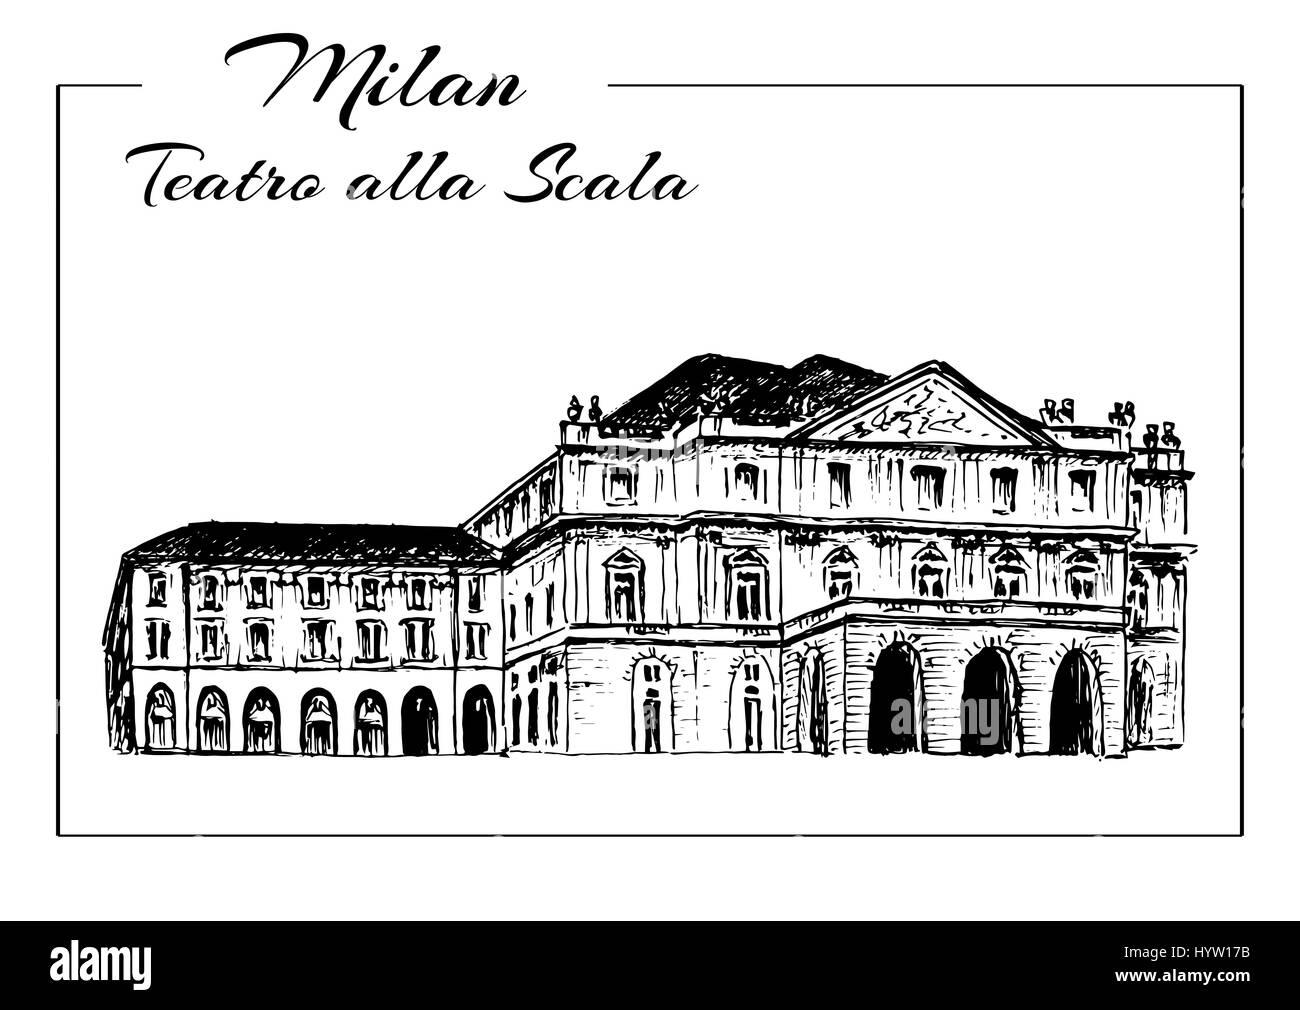 Teatro alla Scala. Milan Opera House, Italy. Musical theater. Vector hand drawn sketch illustration. - Stock Image